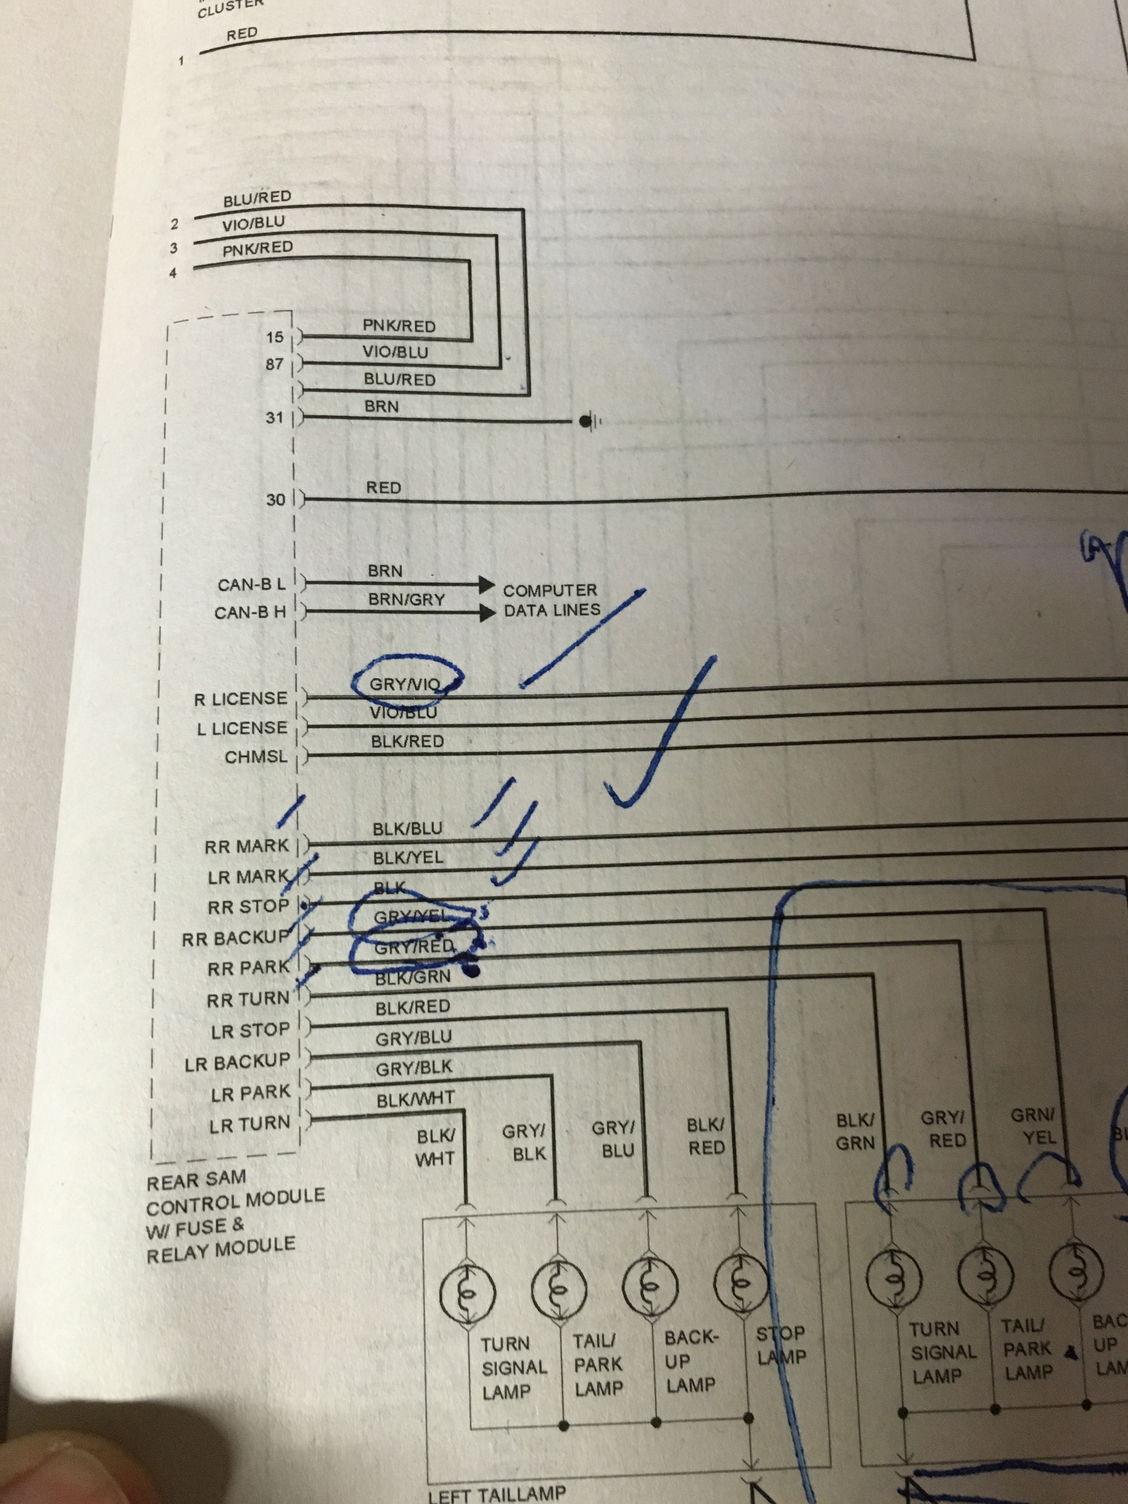 Mercedes Benz Headlight Wiring Diagram from cimg5.ibsrv.net